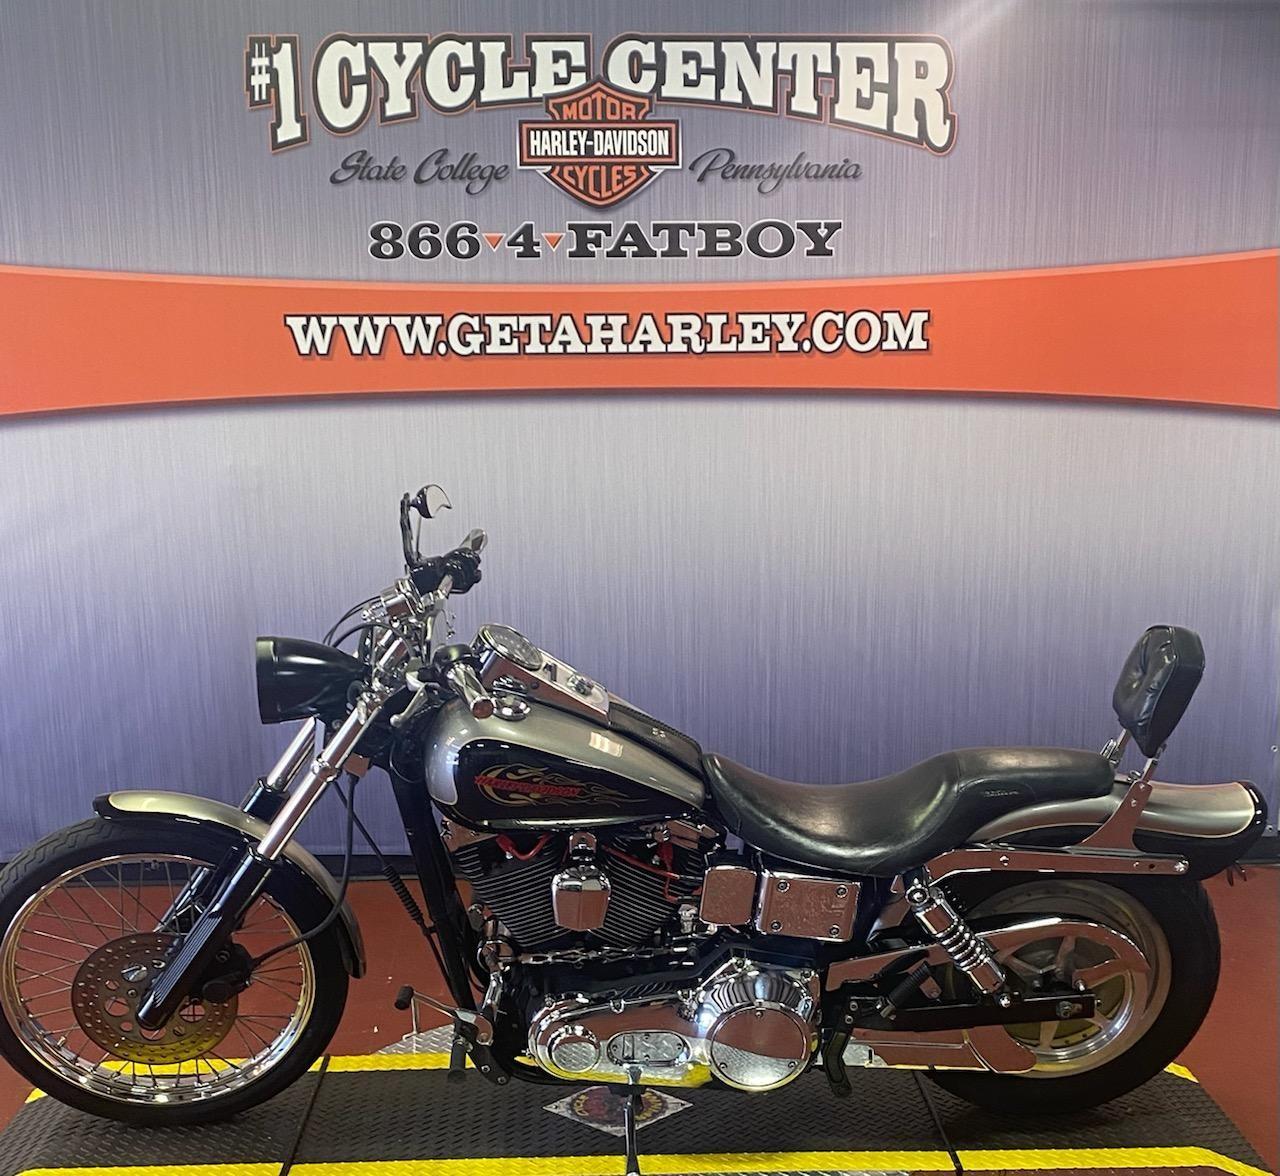 1997 Harley-Davidson FXDWG at #1 Cycle Center Harley-Davidson